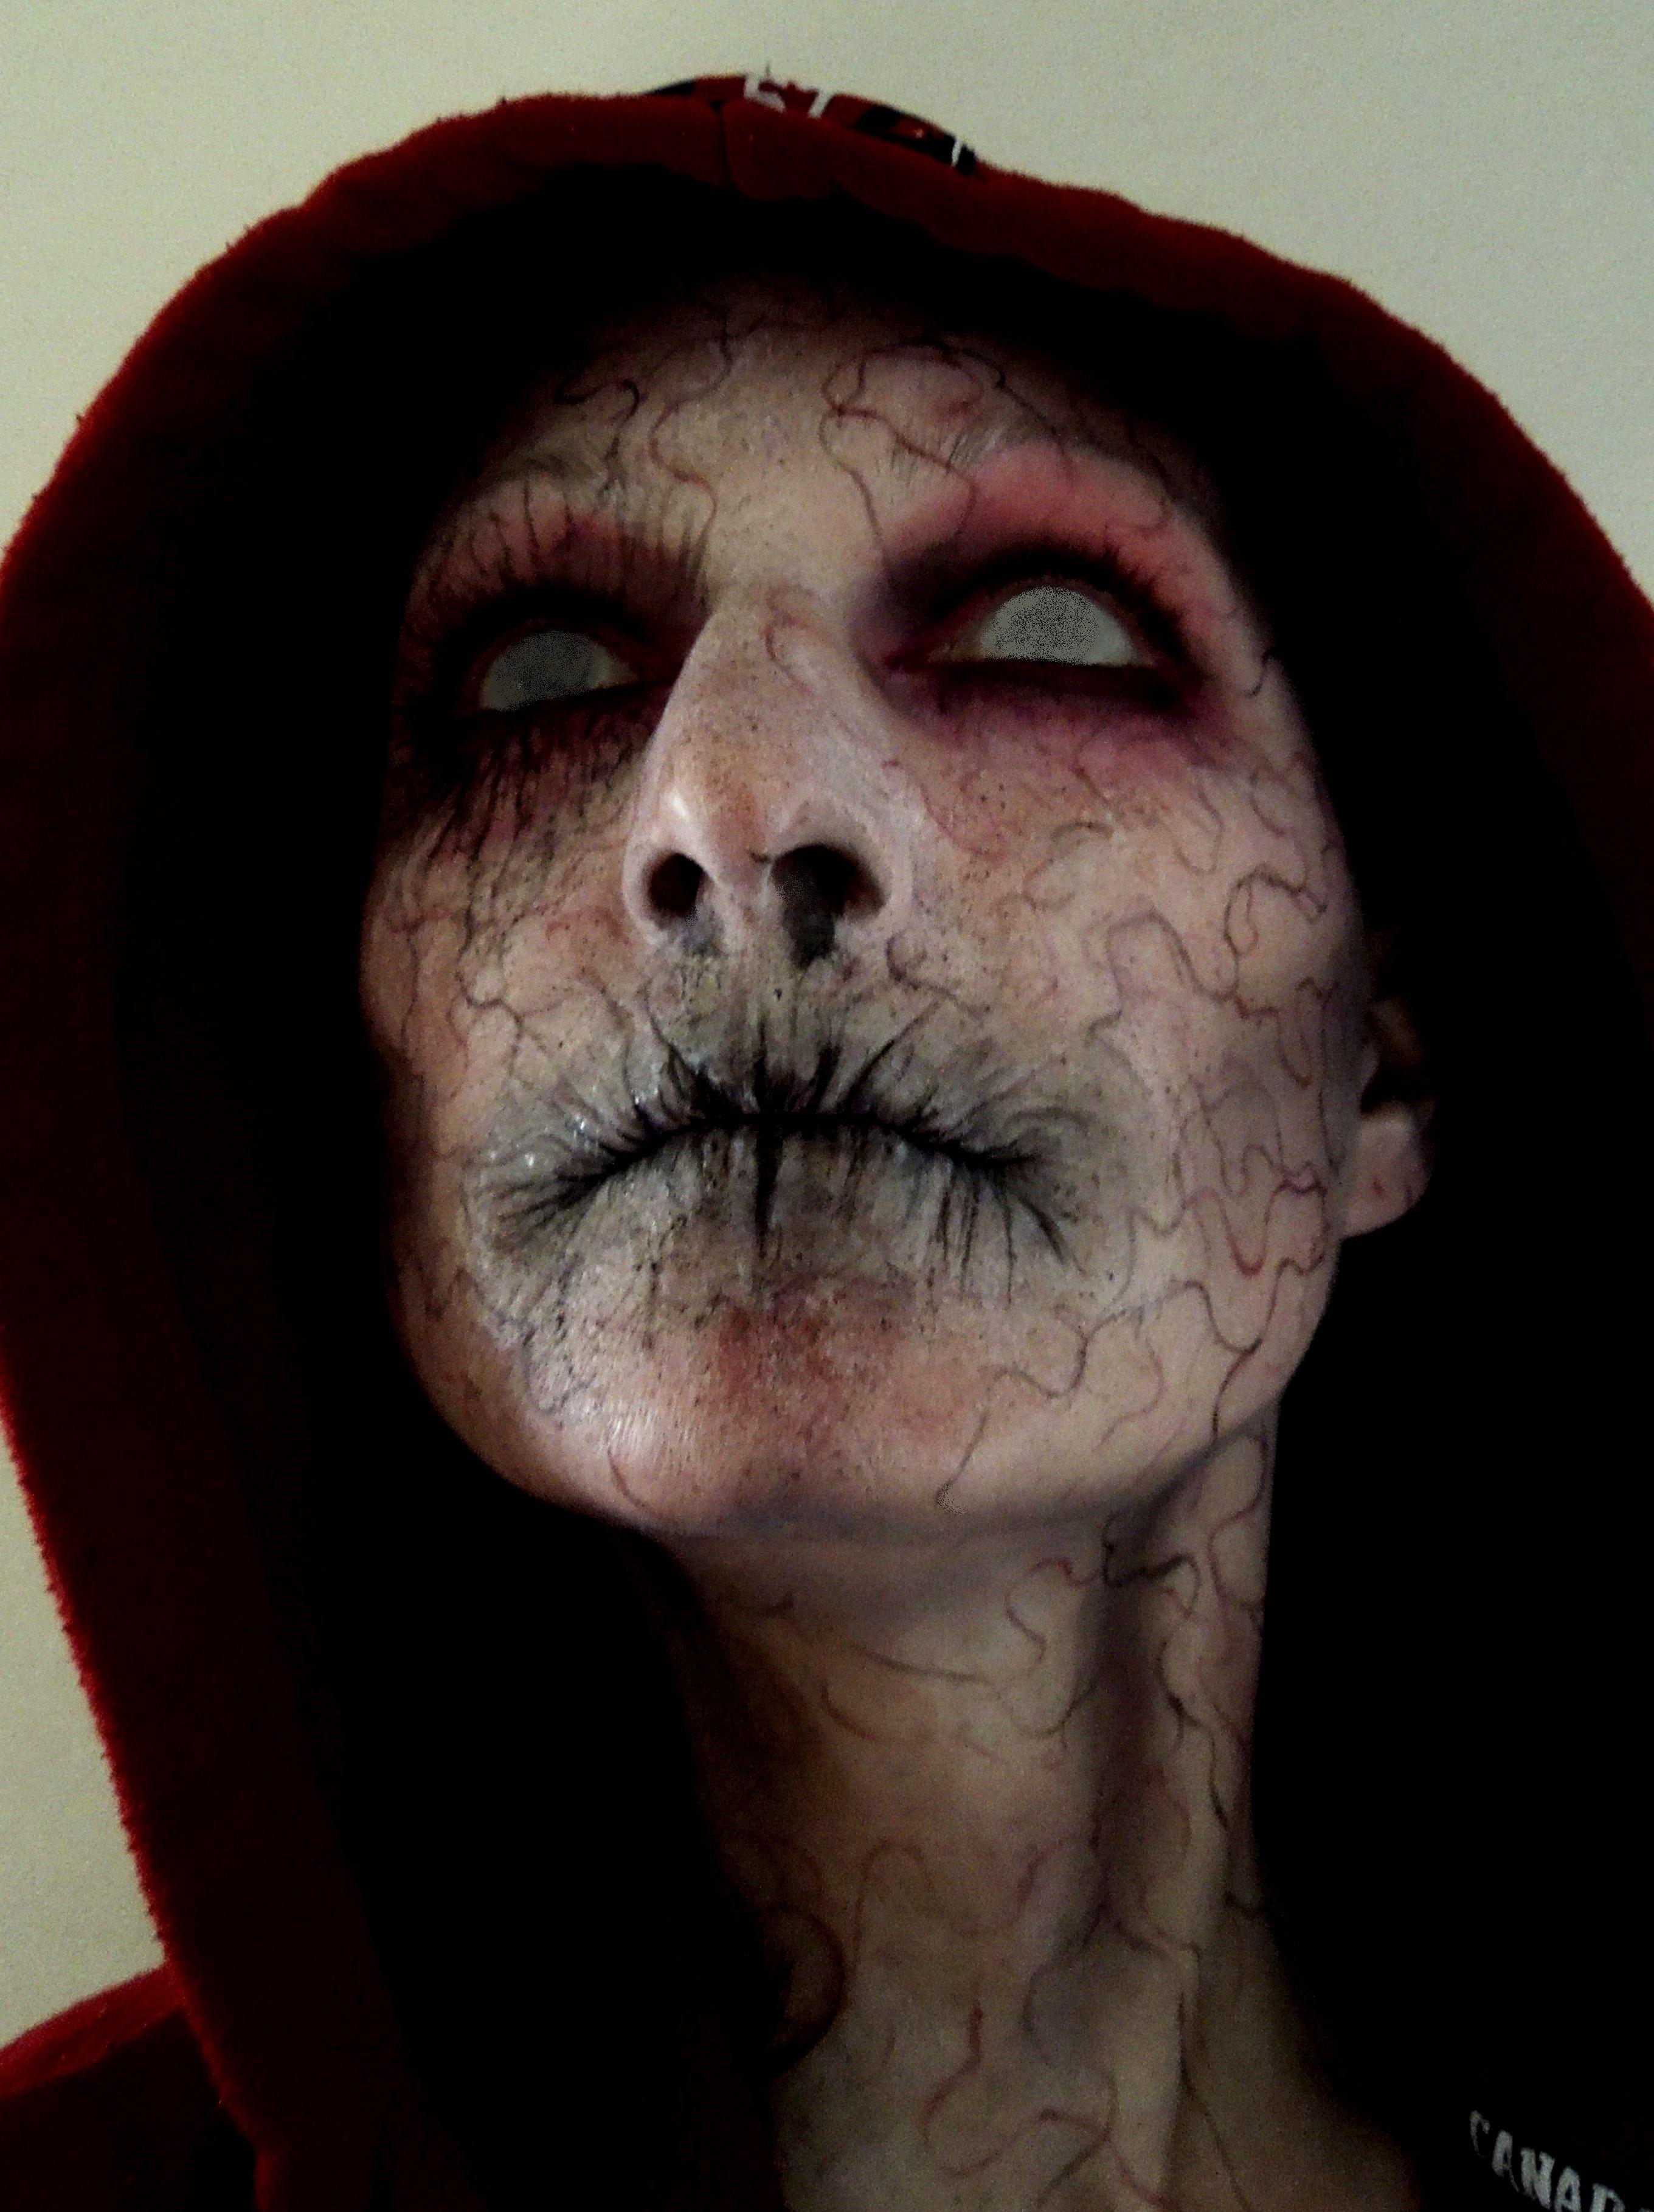 20+ Of The Creepiest Halloween Makeup Ideas | Monster makeup ...